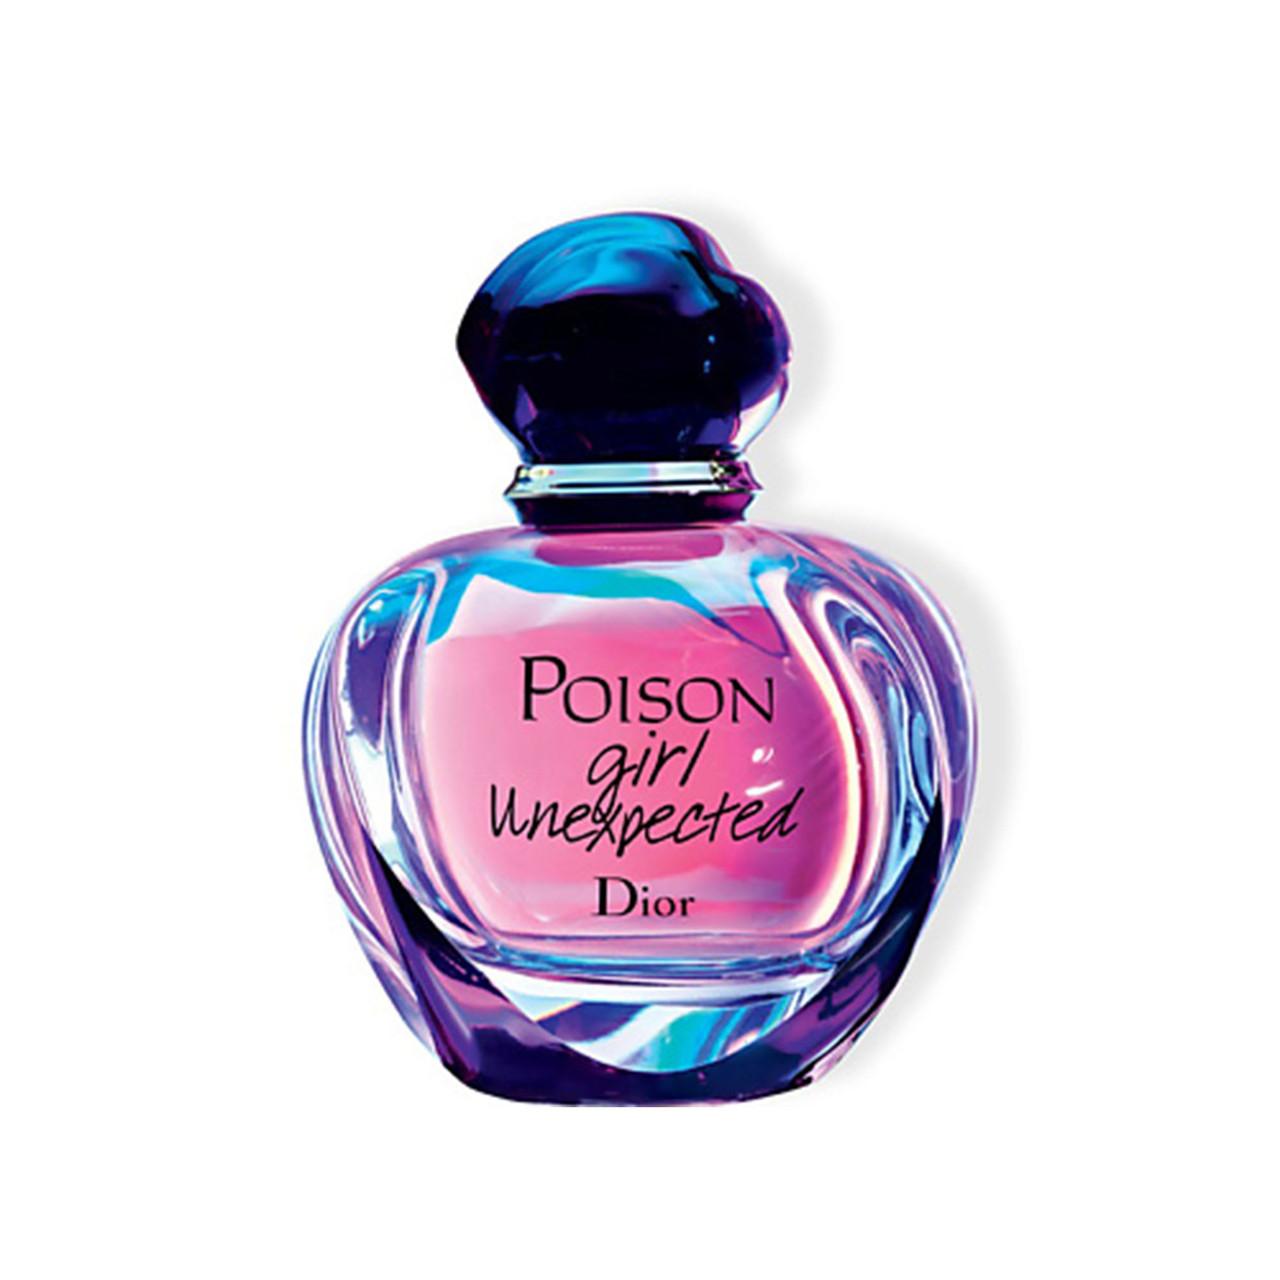 Туалетная вода Dior Poison Girl Unexpected 50ml (Оригинал - Франция)